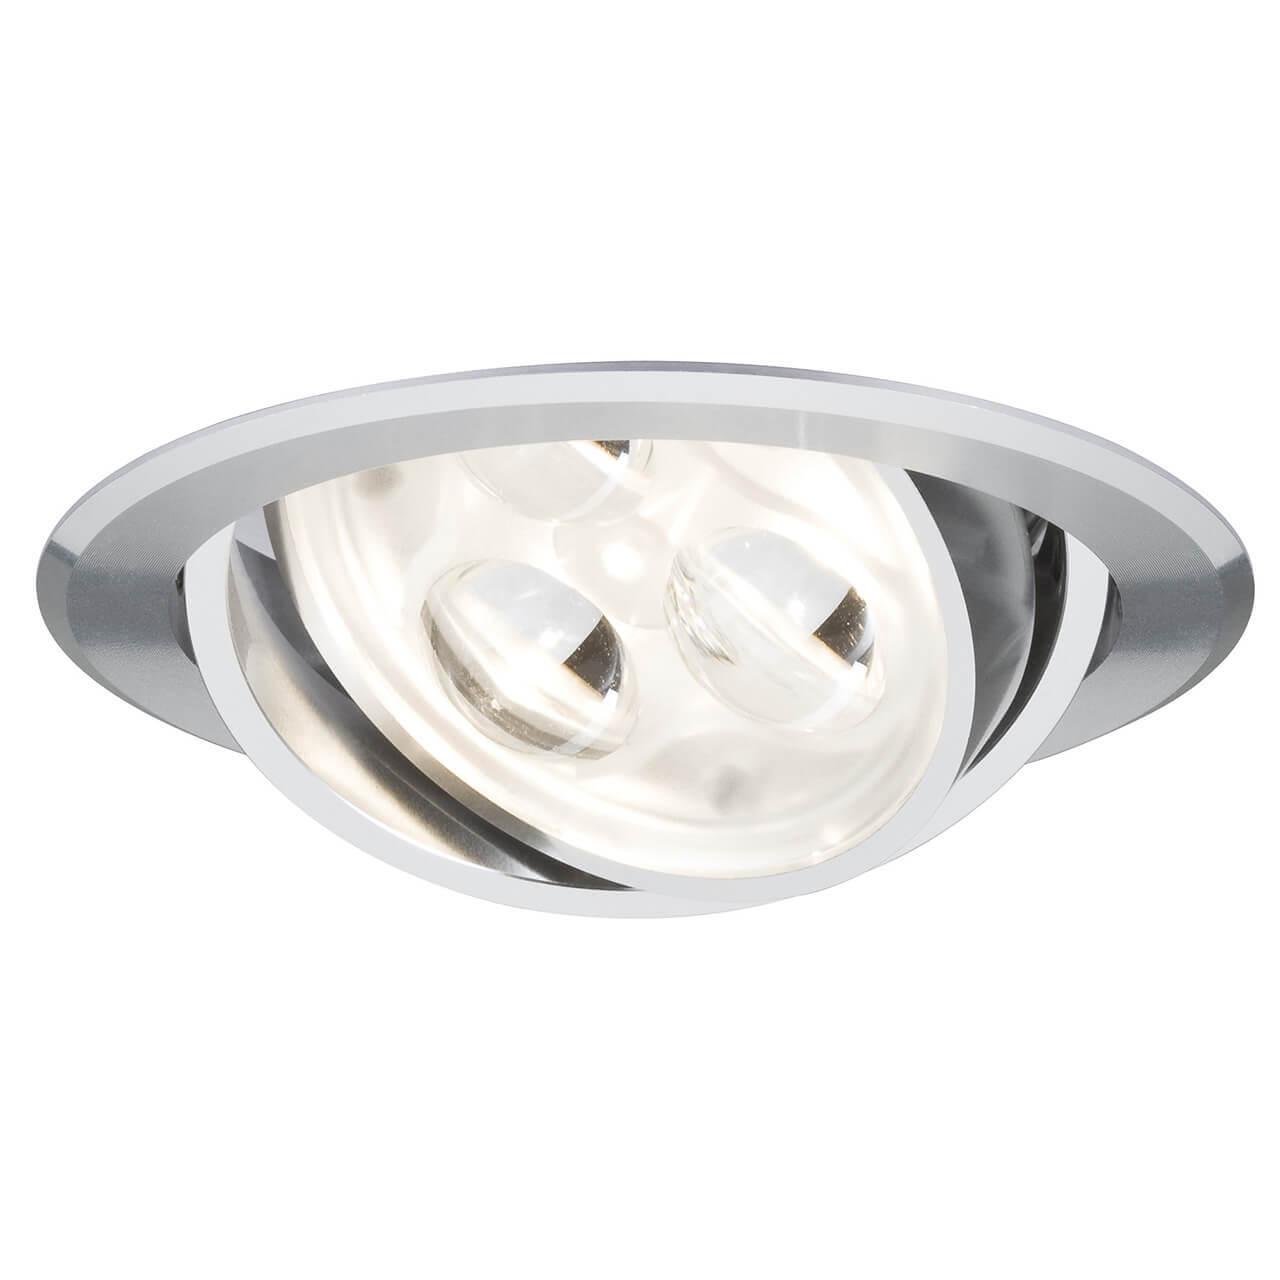 Мебельный светодиодный светильник Paulmann Micro Line Drilled Alu Led 93542 paulmann wd arneb ip23 led 1x9w chrom alu acryl